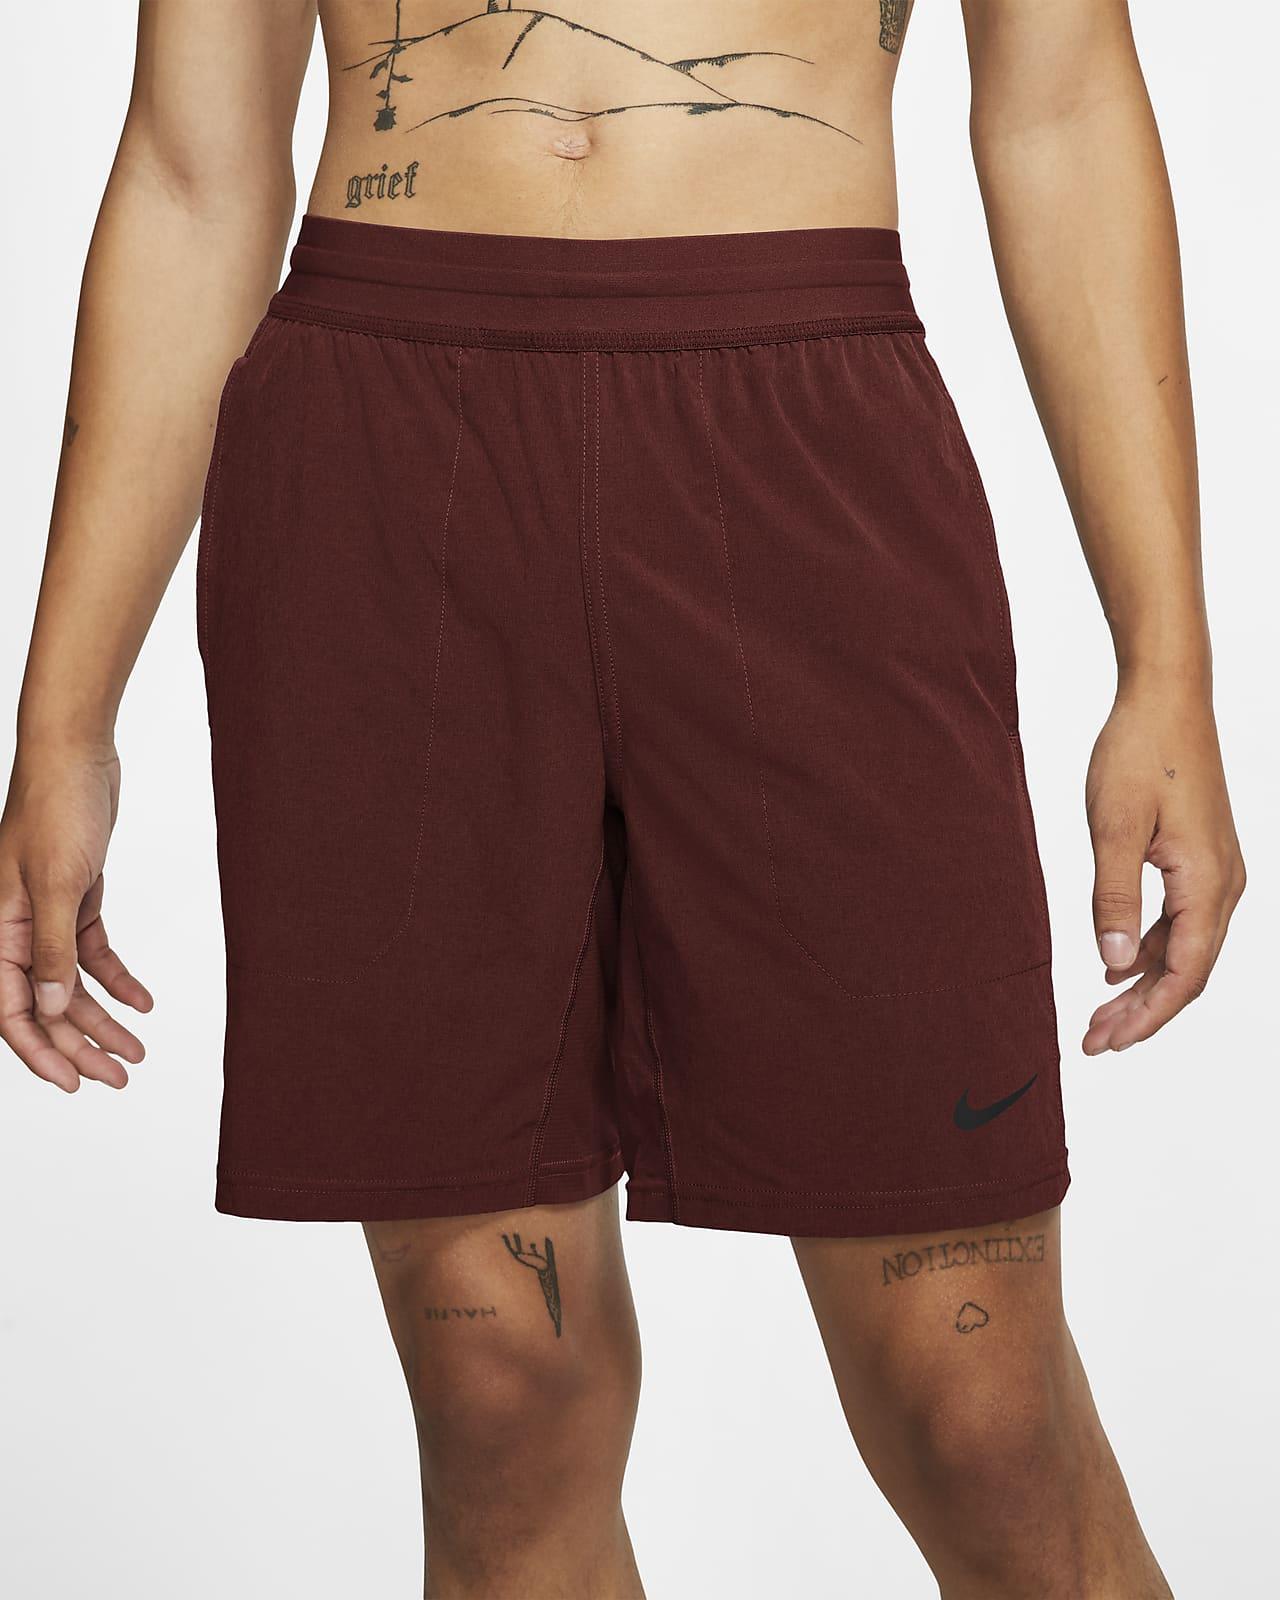 Nike Flex Men's Training Shorts